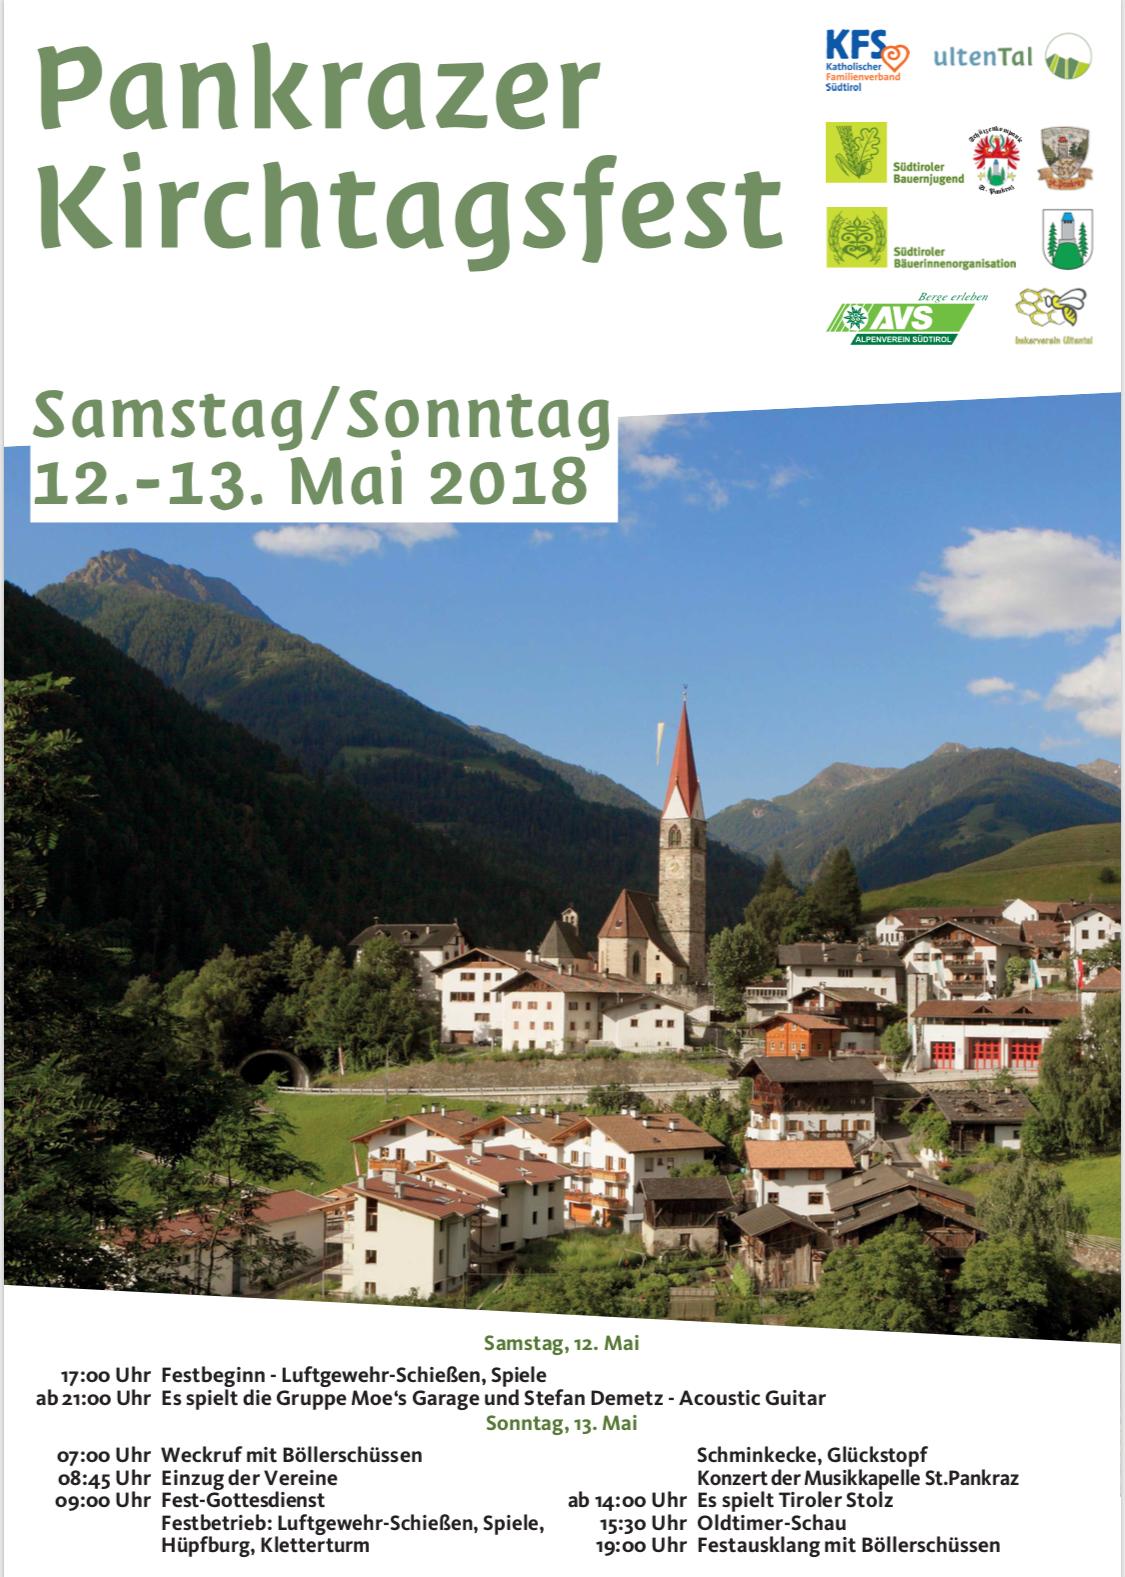 Pankrazer Kirchtag 2018